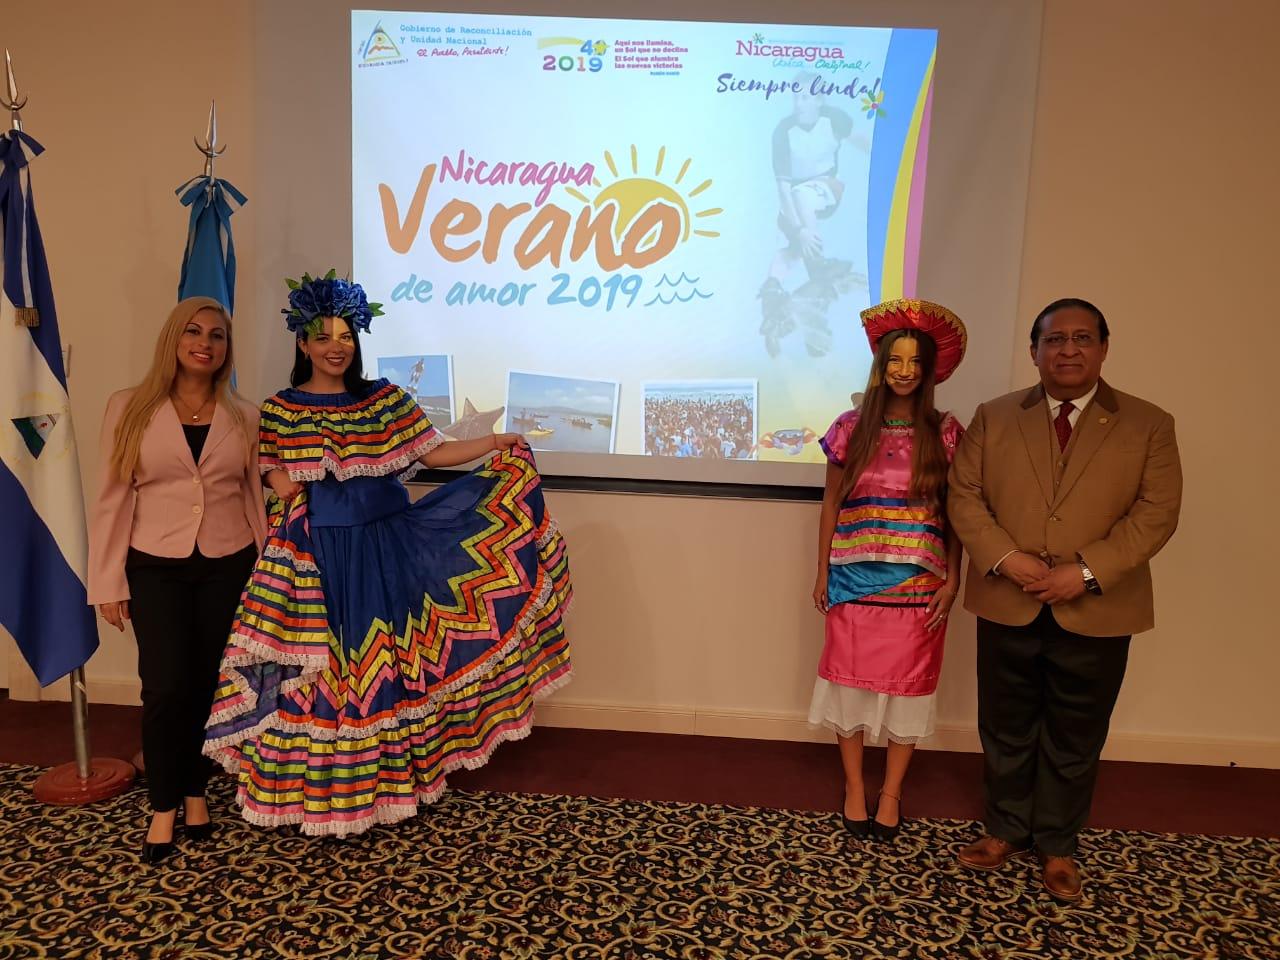 Nicaragua en Argentina